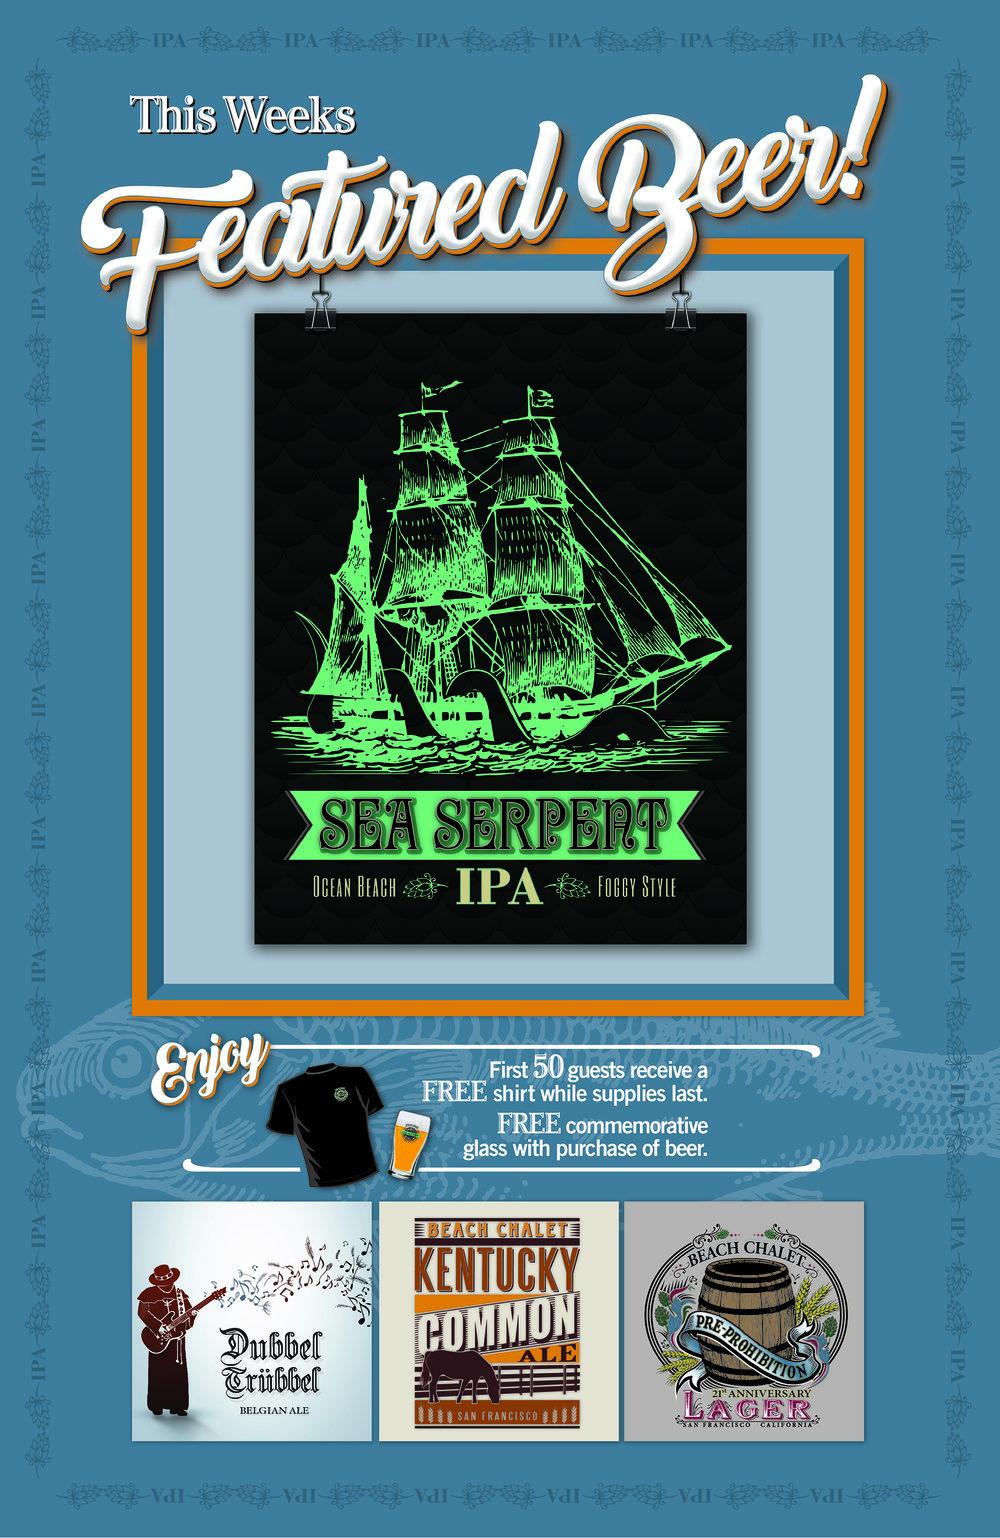 beer-Feature-Poster-serp-dub-01.jpg